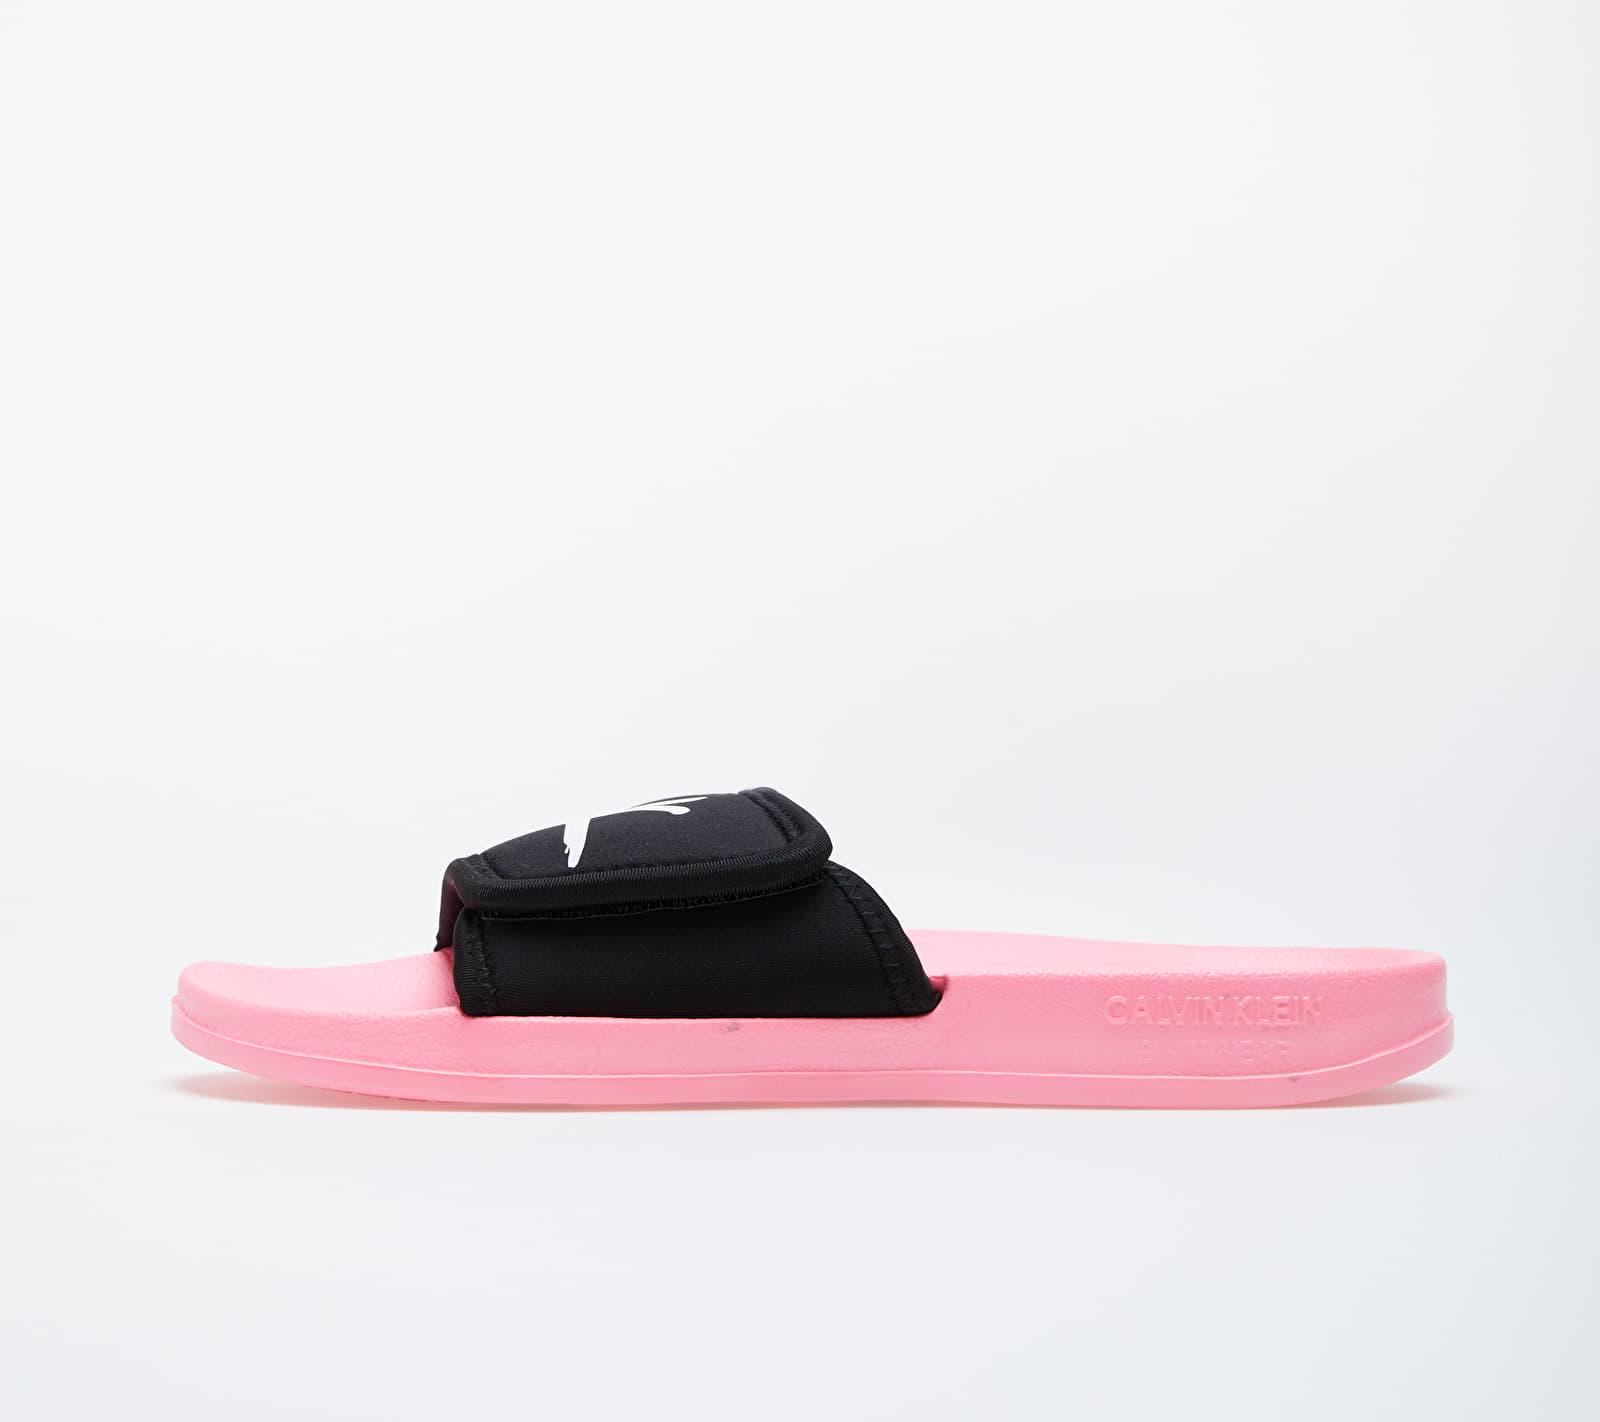 Calvin Klein Vecro Slide Pink 35-37 KW0KW01028-0J6